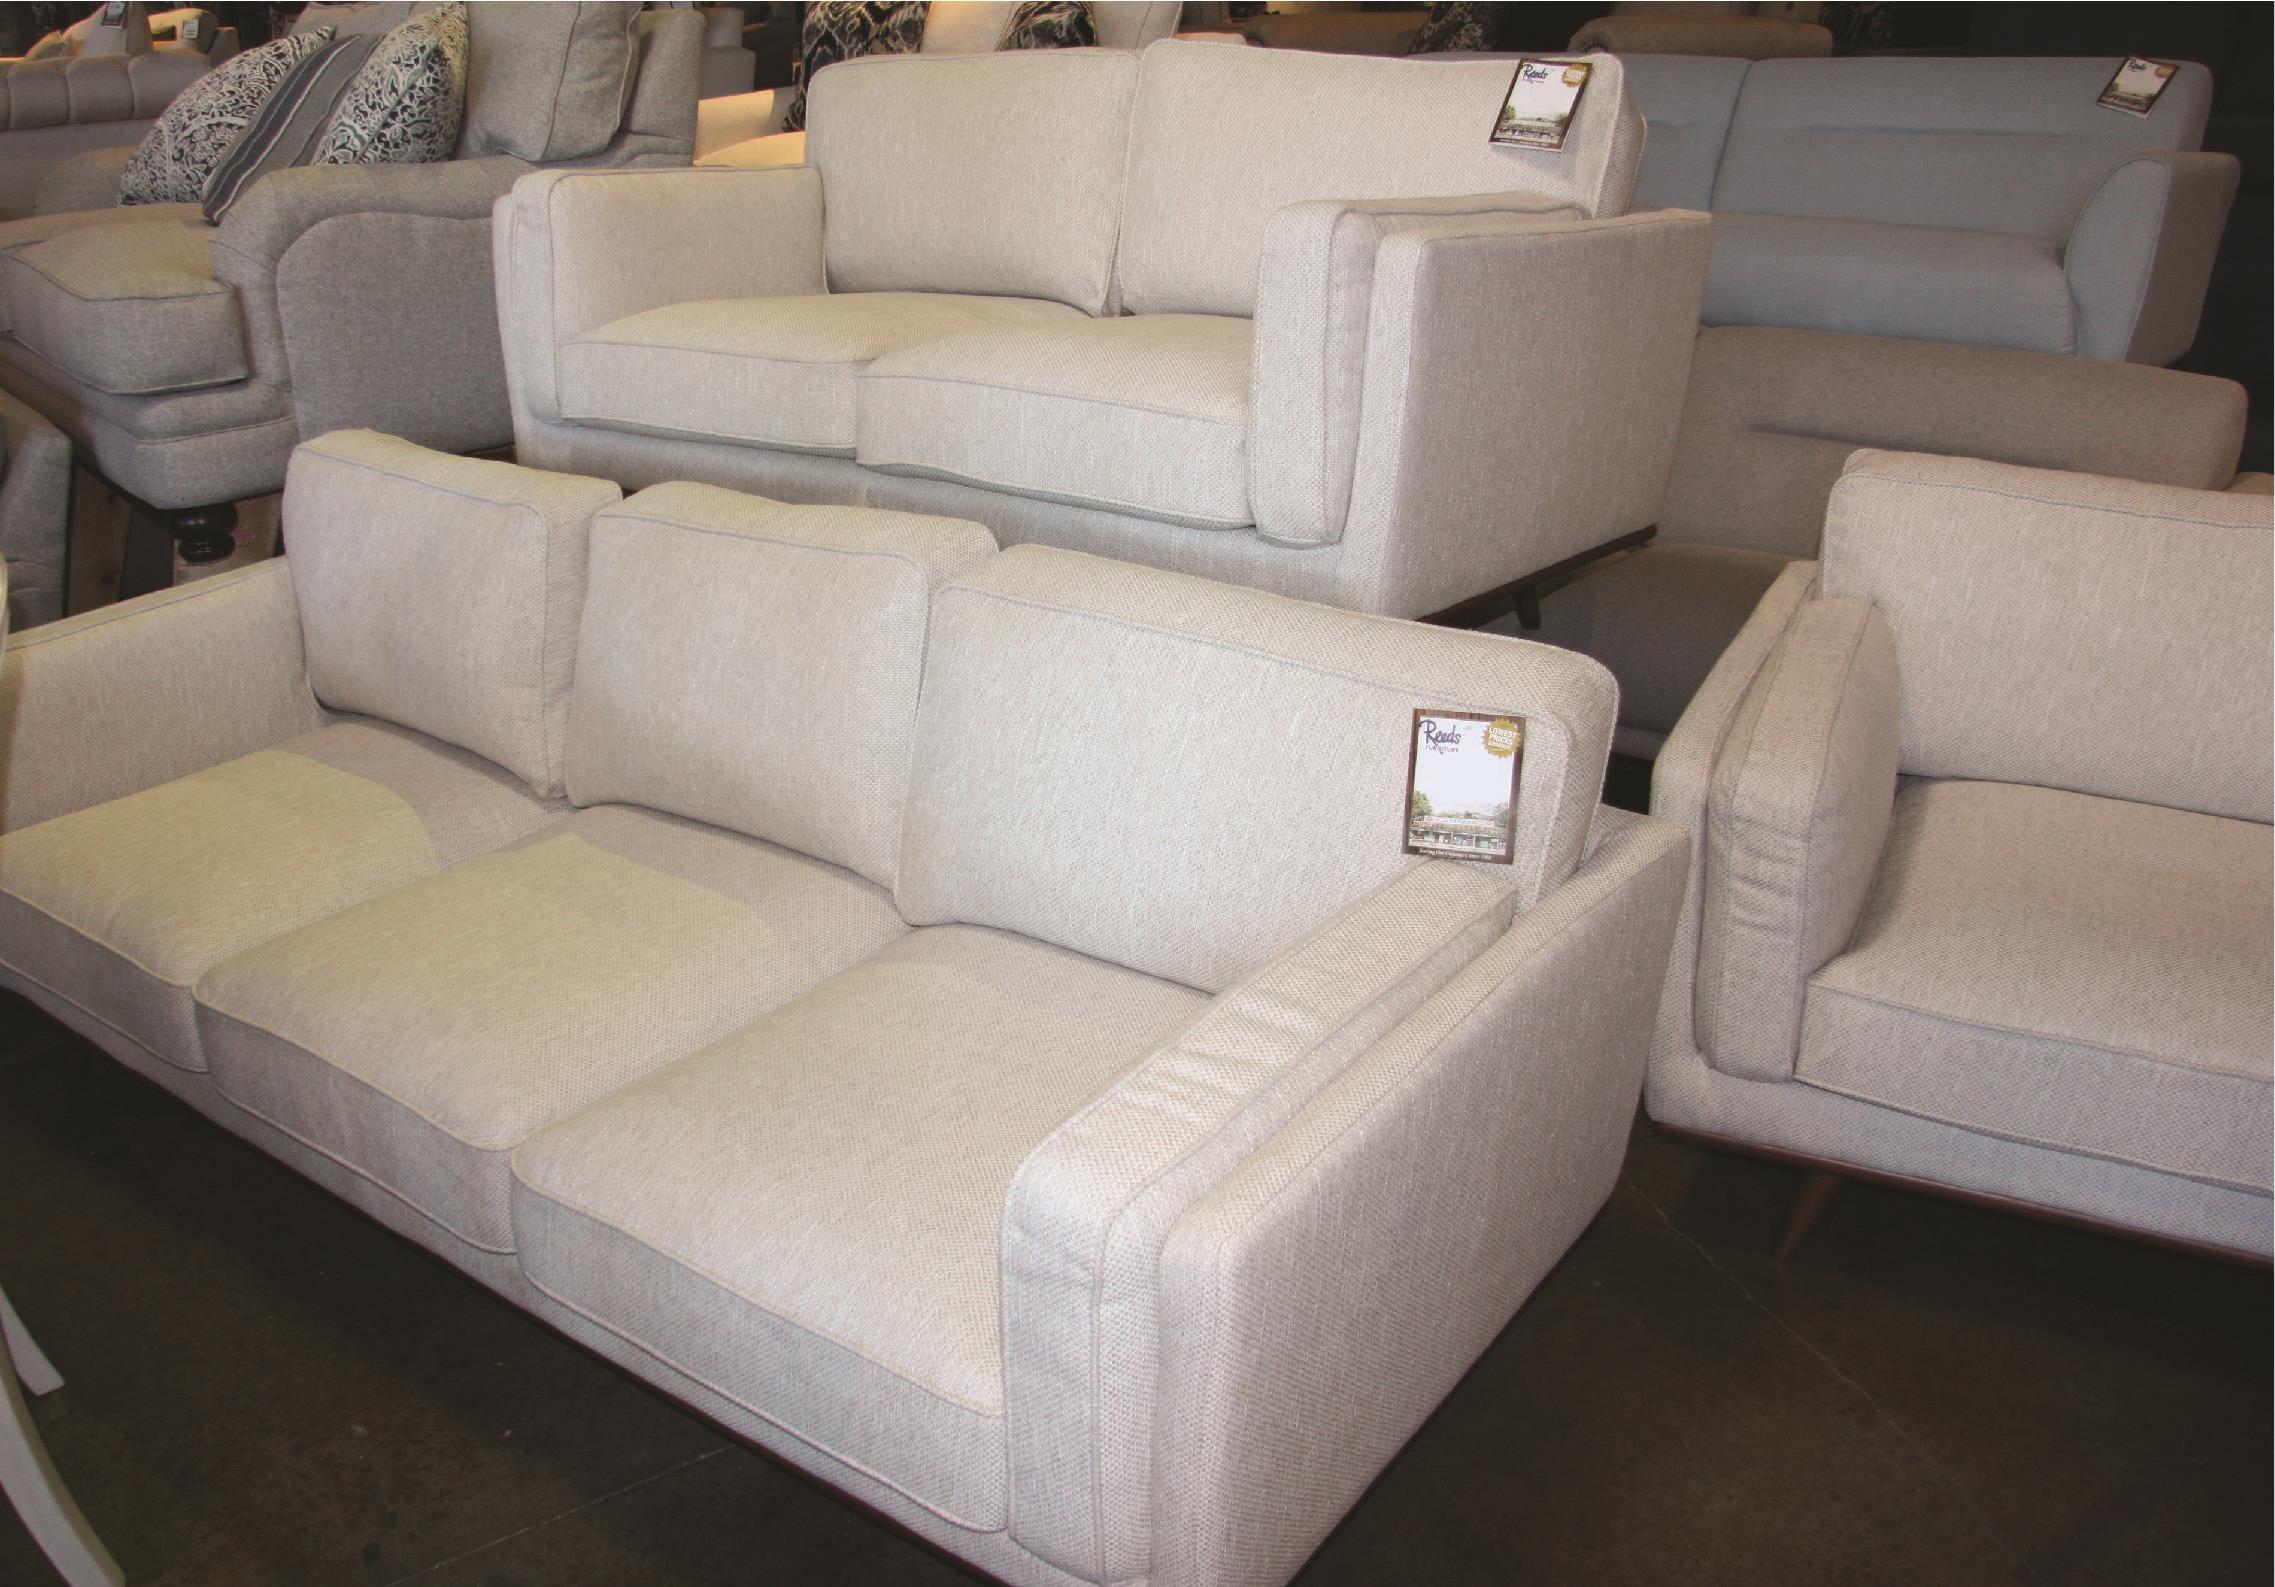 Loveseat with Memory Foam Seat